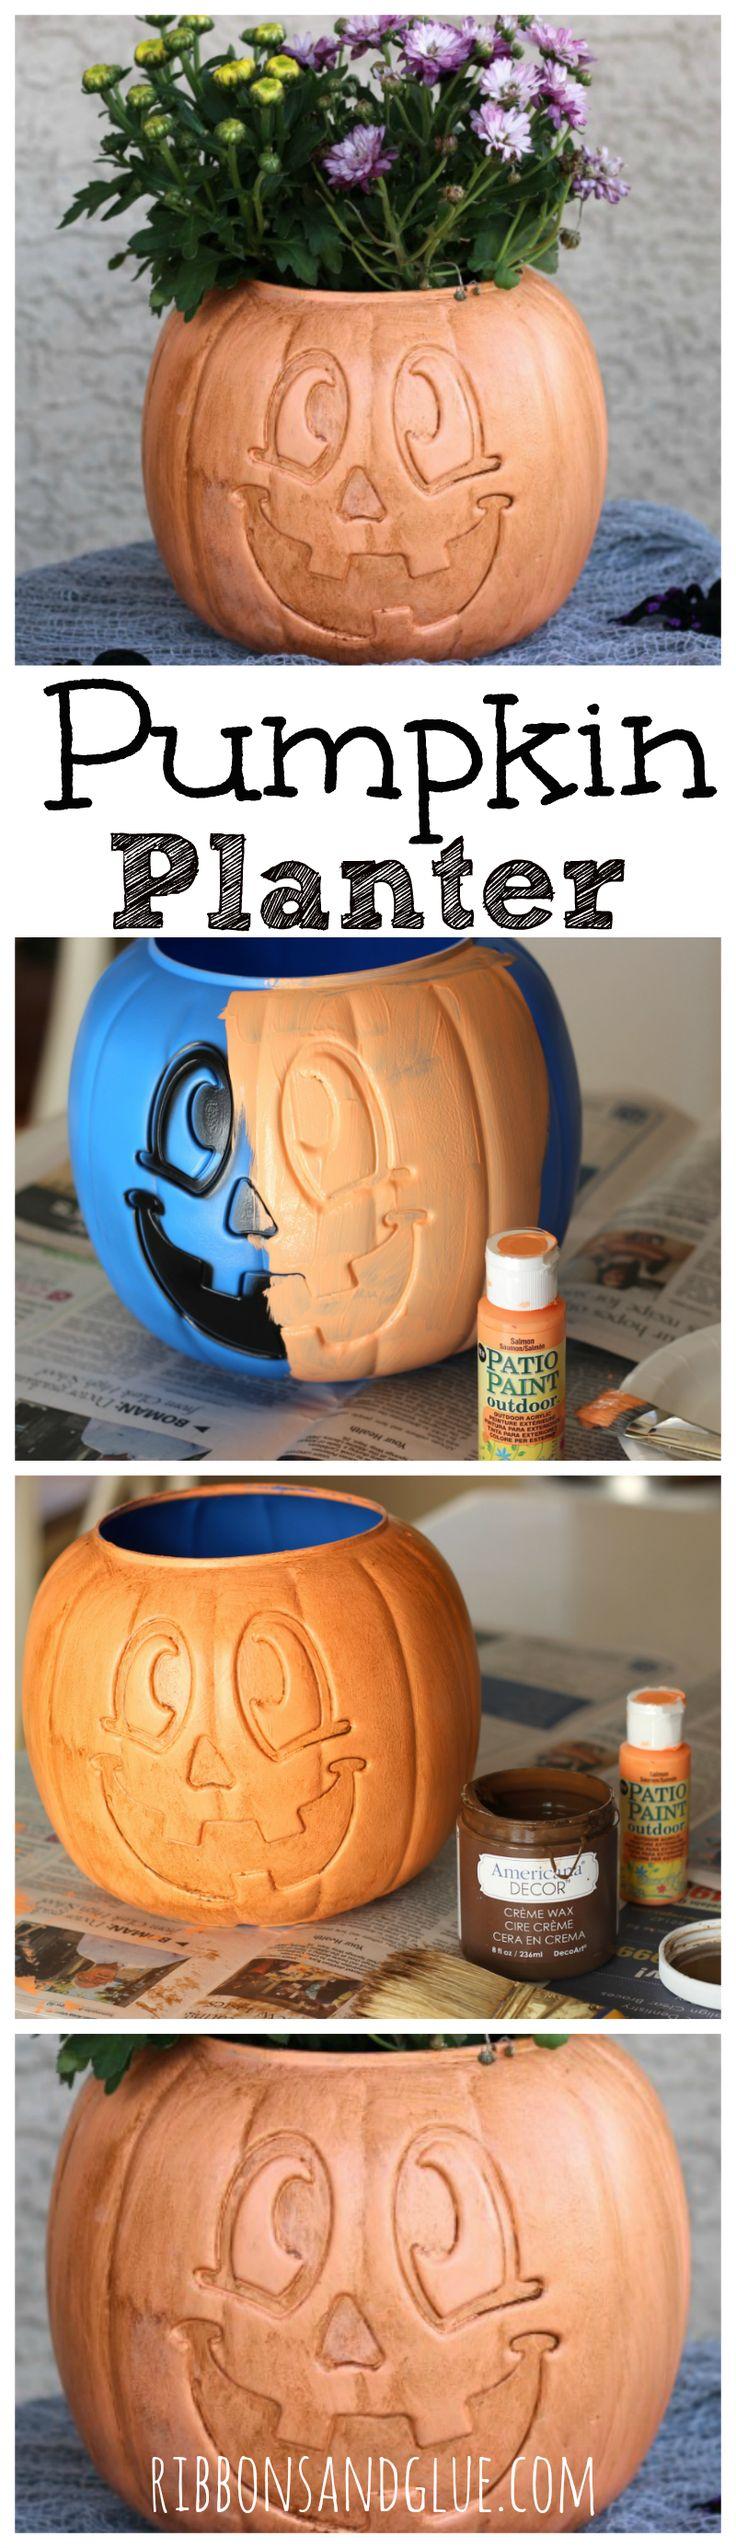 Best 25+ Halloween diy ideas on Pinterest | DIY Halloween, Harry ...